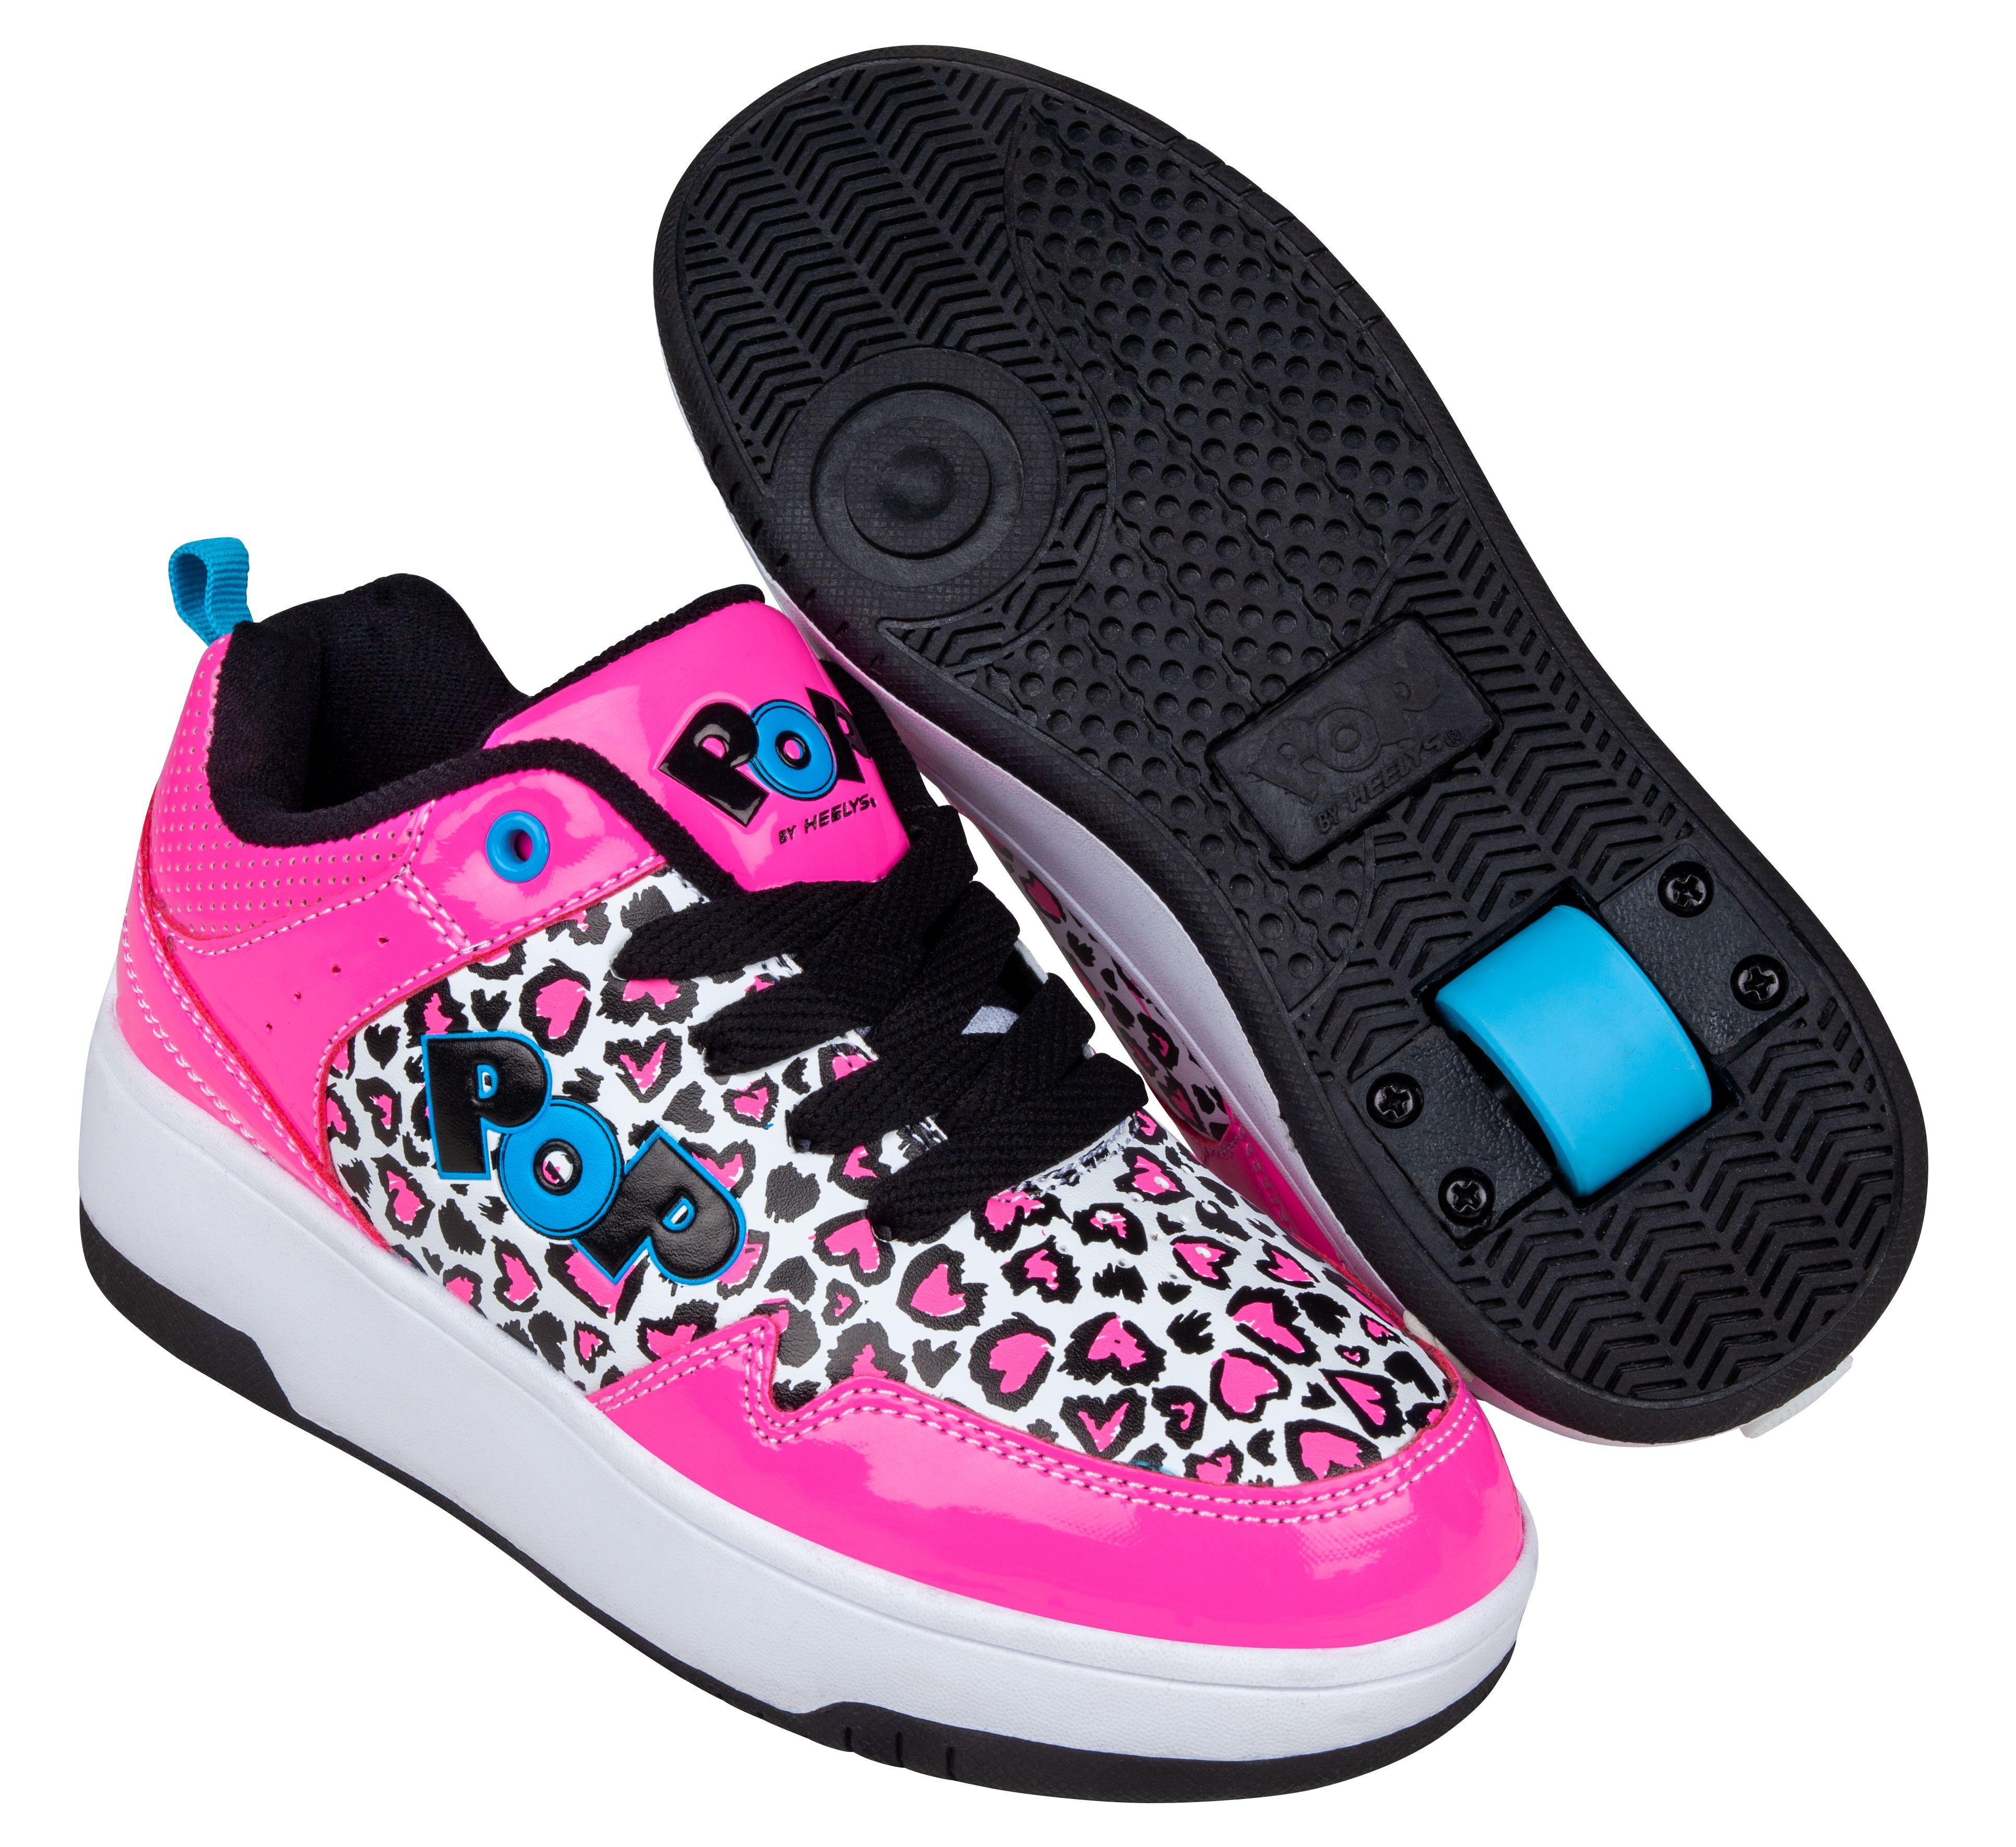 Heelys POP Shoes - Neon Pink (size 35) (POP-G1W-0060)